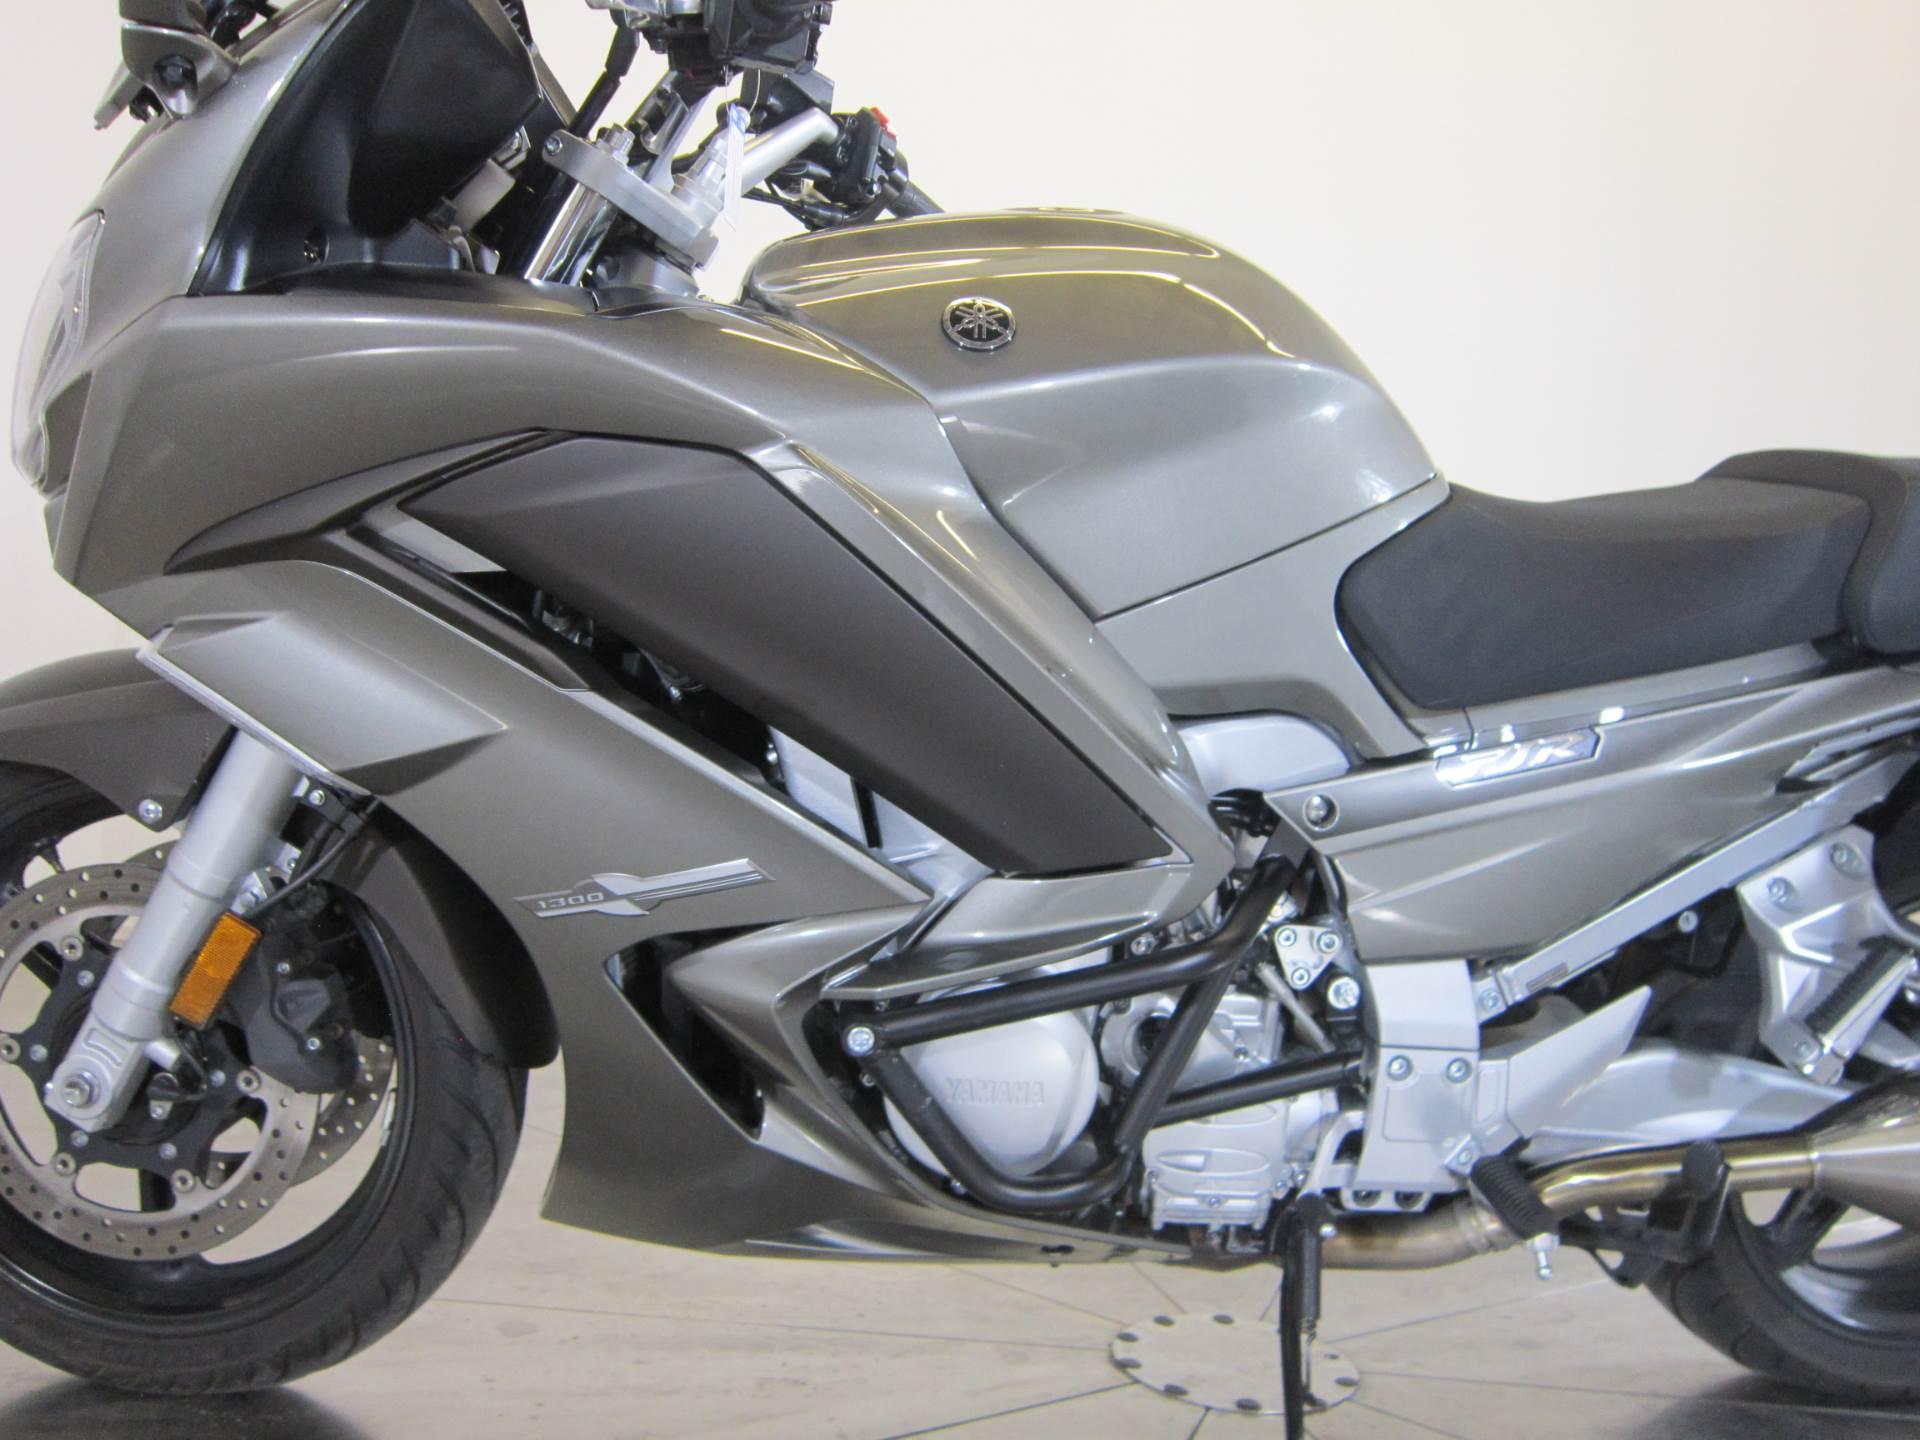 2013 Yamaha FJR1300A 12